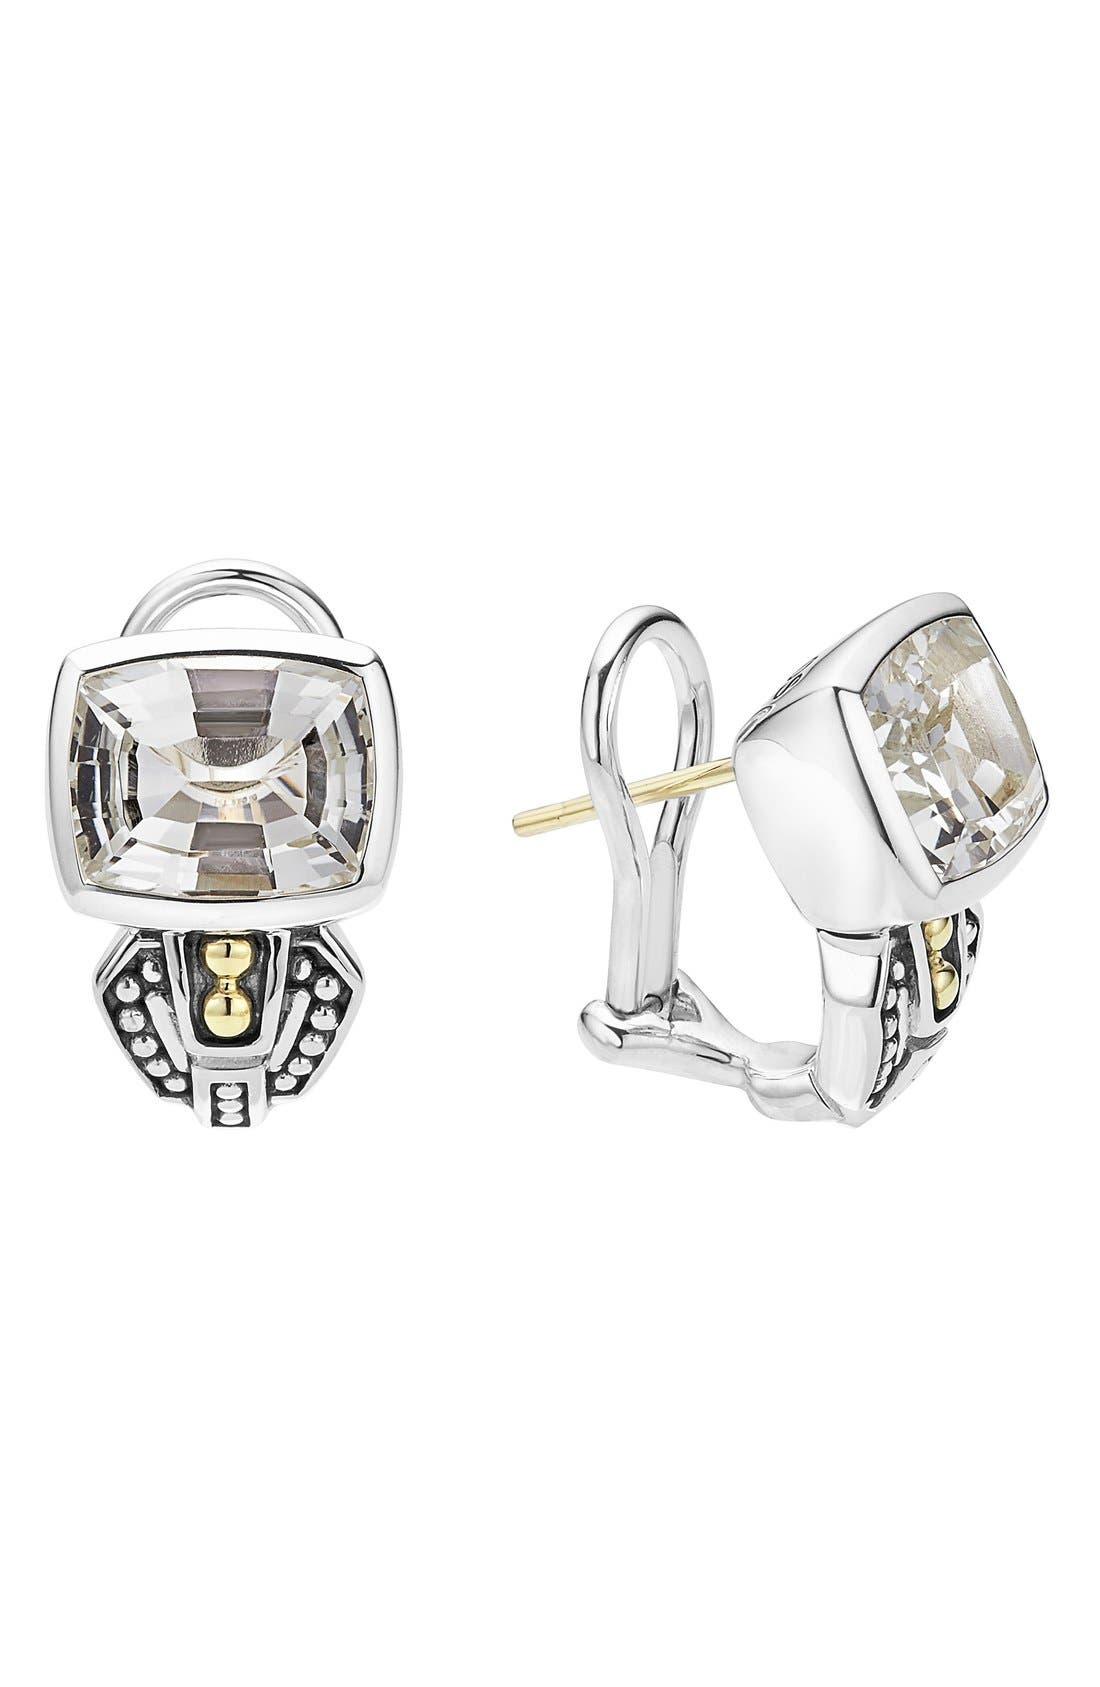 'Caviar Color' Semiprecious Stone Stud Earrings,                         Main,                         color, WHITE TOPAZ